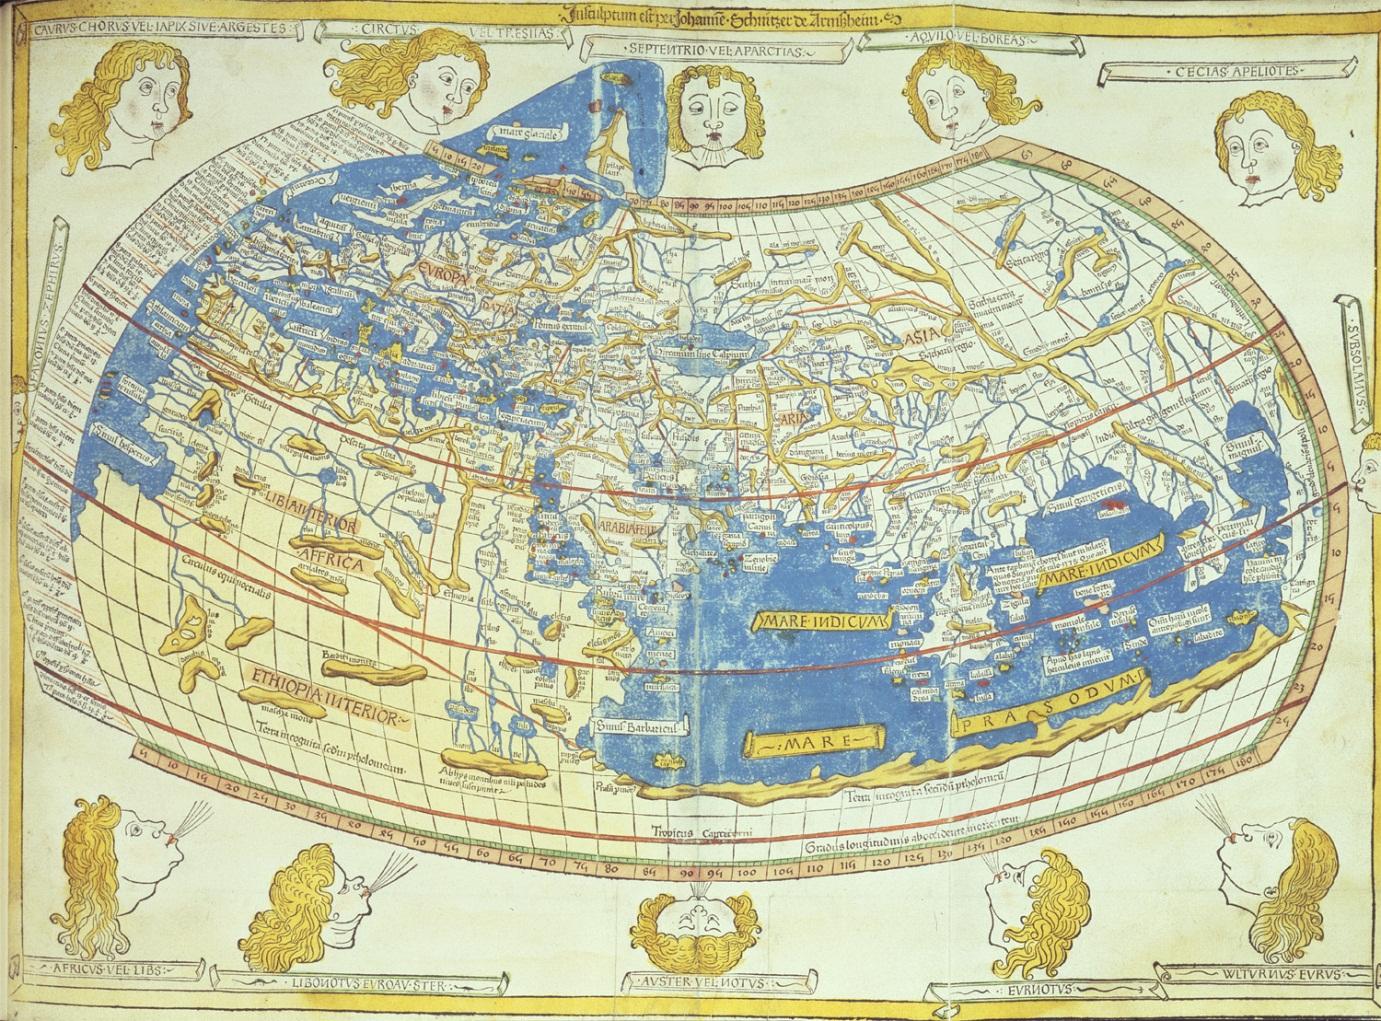 Maps: Atlantis In The Java Sea